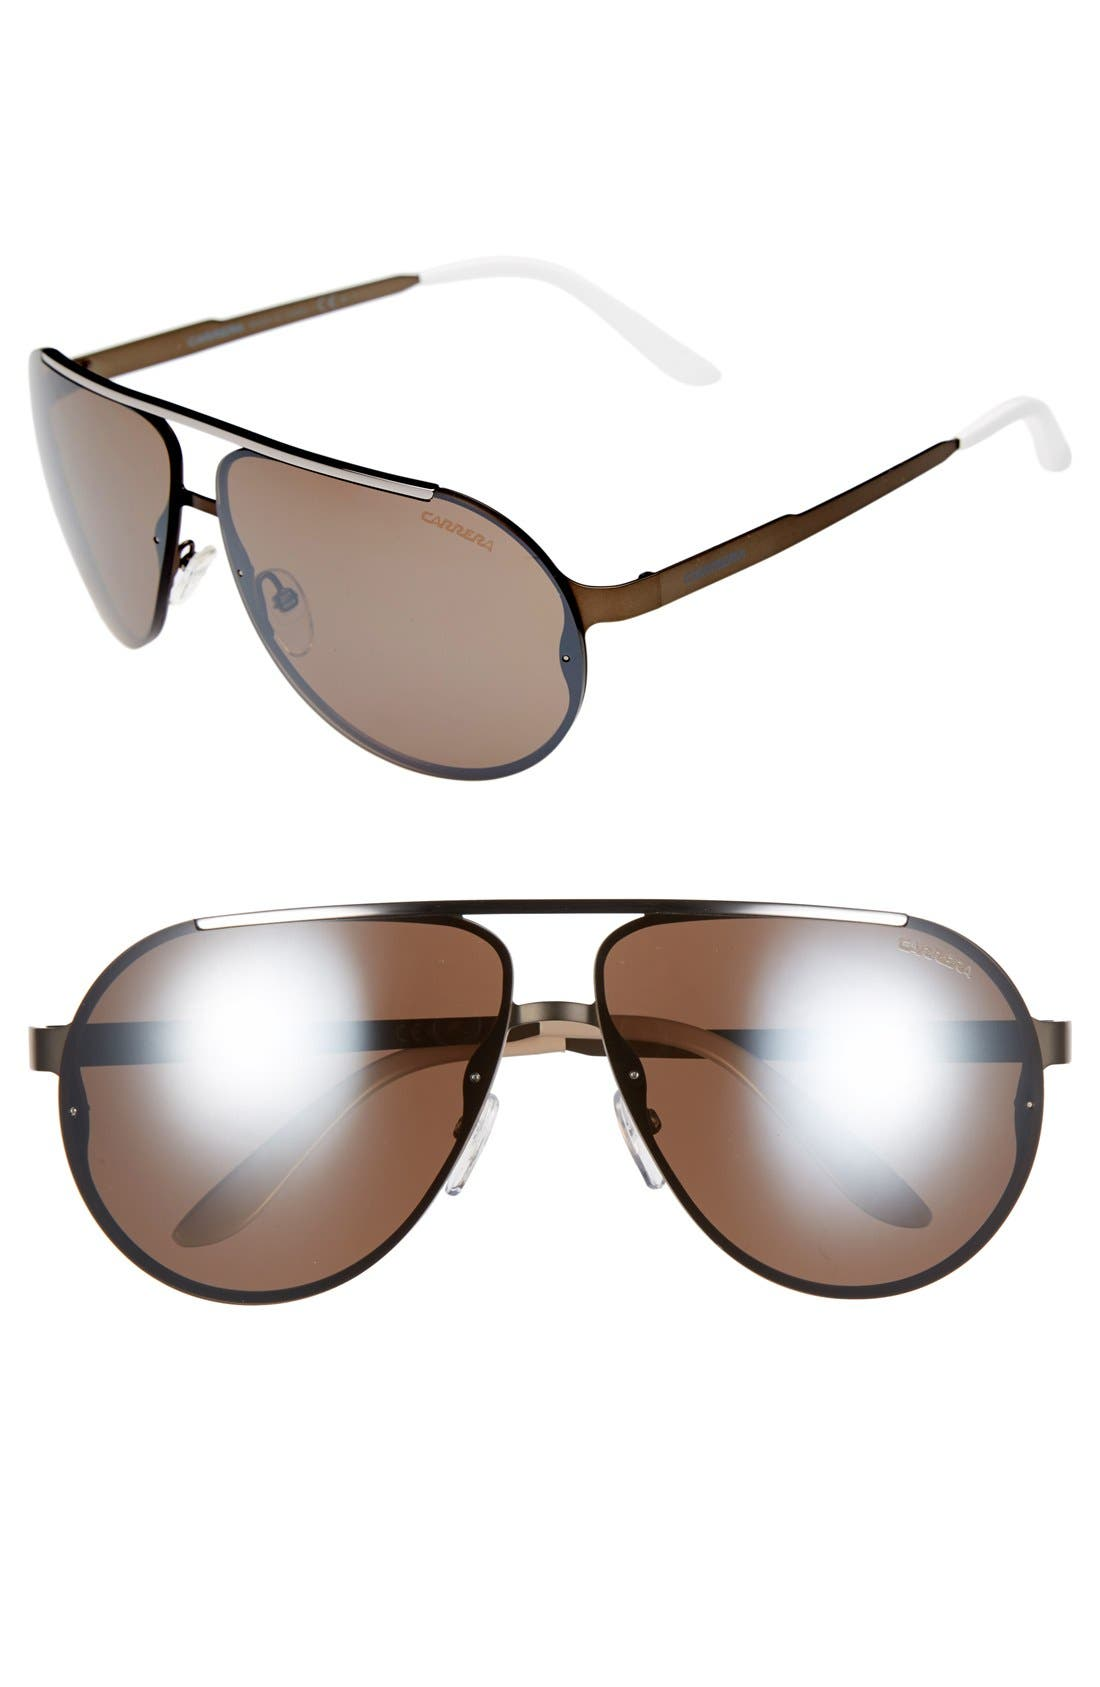 65mm Aviator Sunglasses,                             Main thumbnail 5, color,